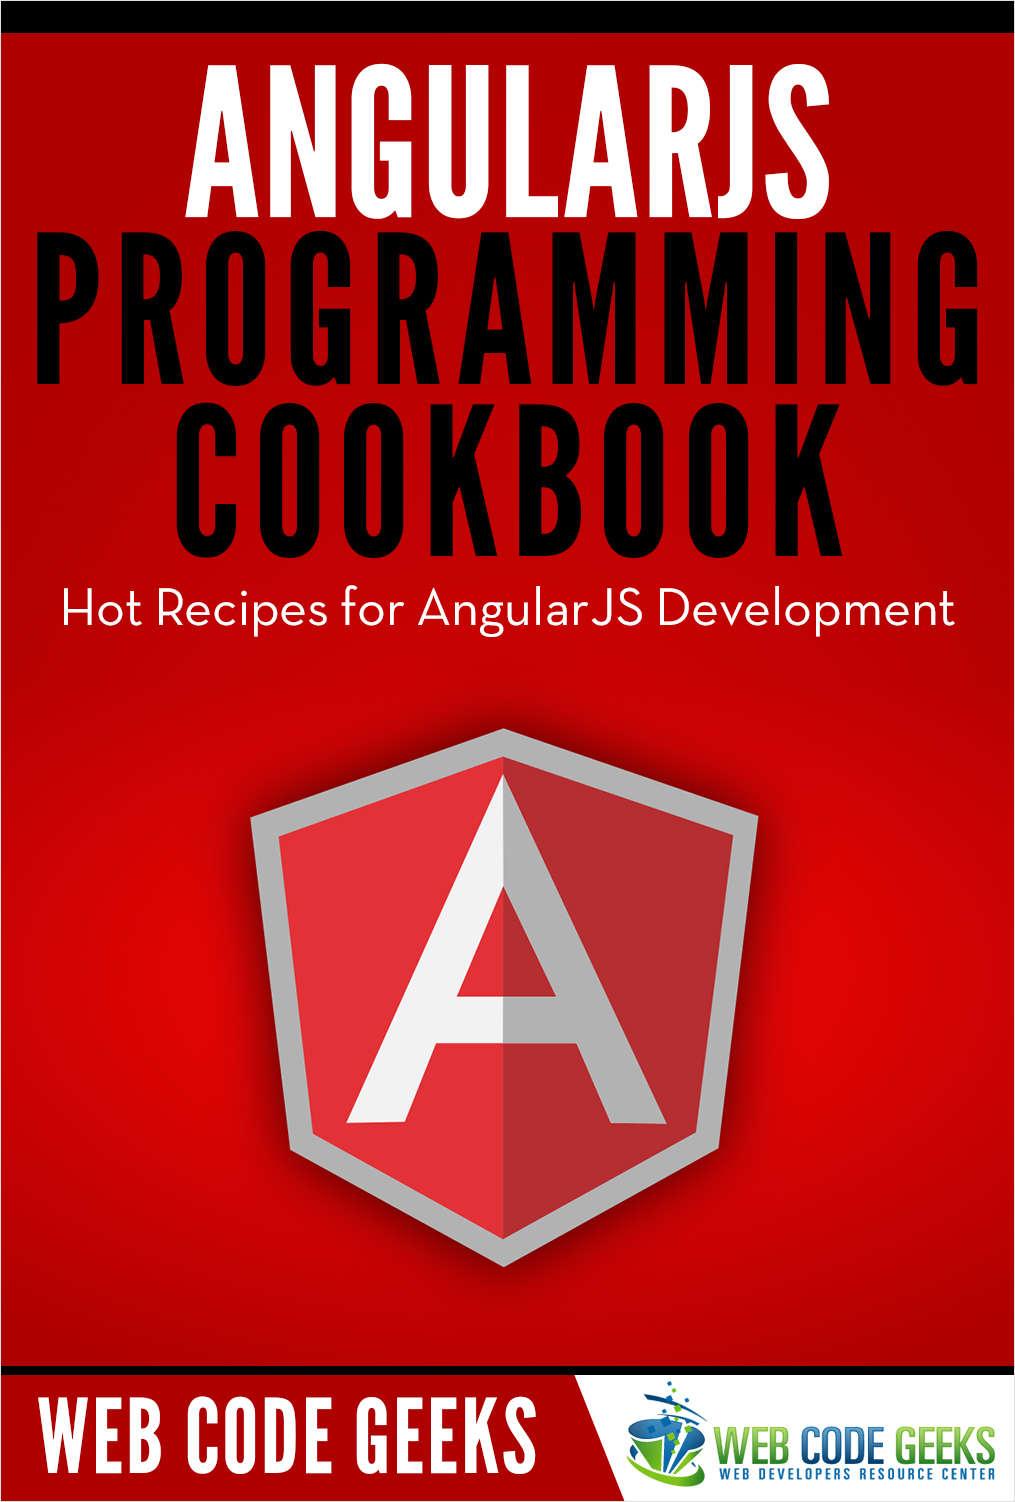 AngularJS Programming Cookbook